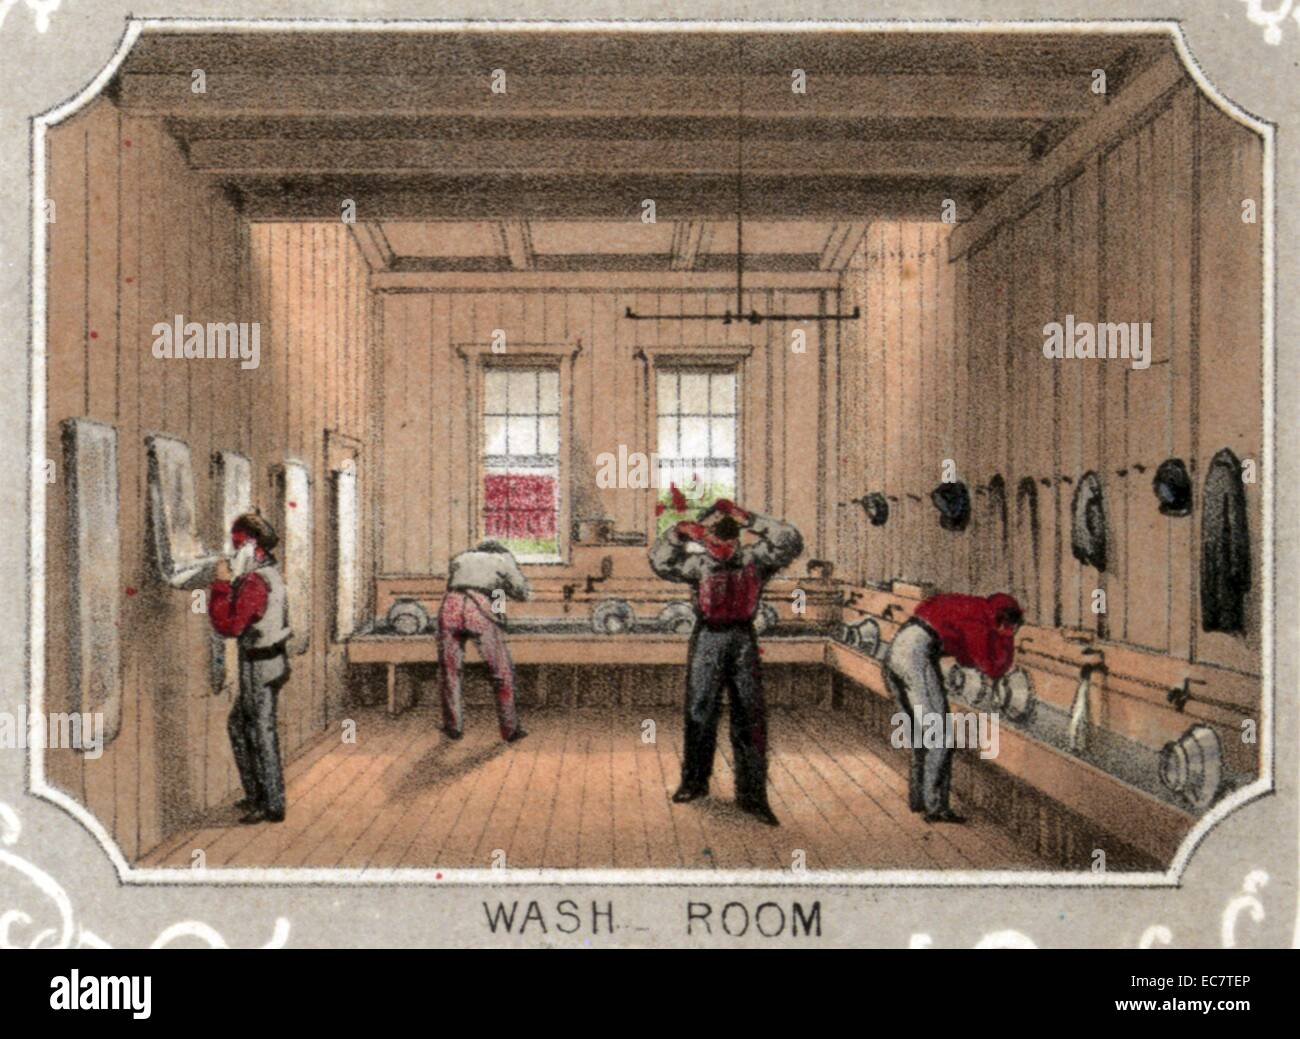 Patienten-Bad im Klinikum Bürger ehrenamtlich, Ecke Broad St. & Washington Avenue, Philadelphia Stockbild